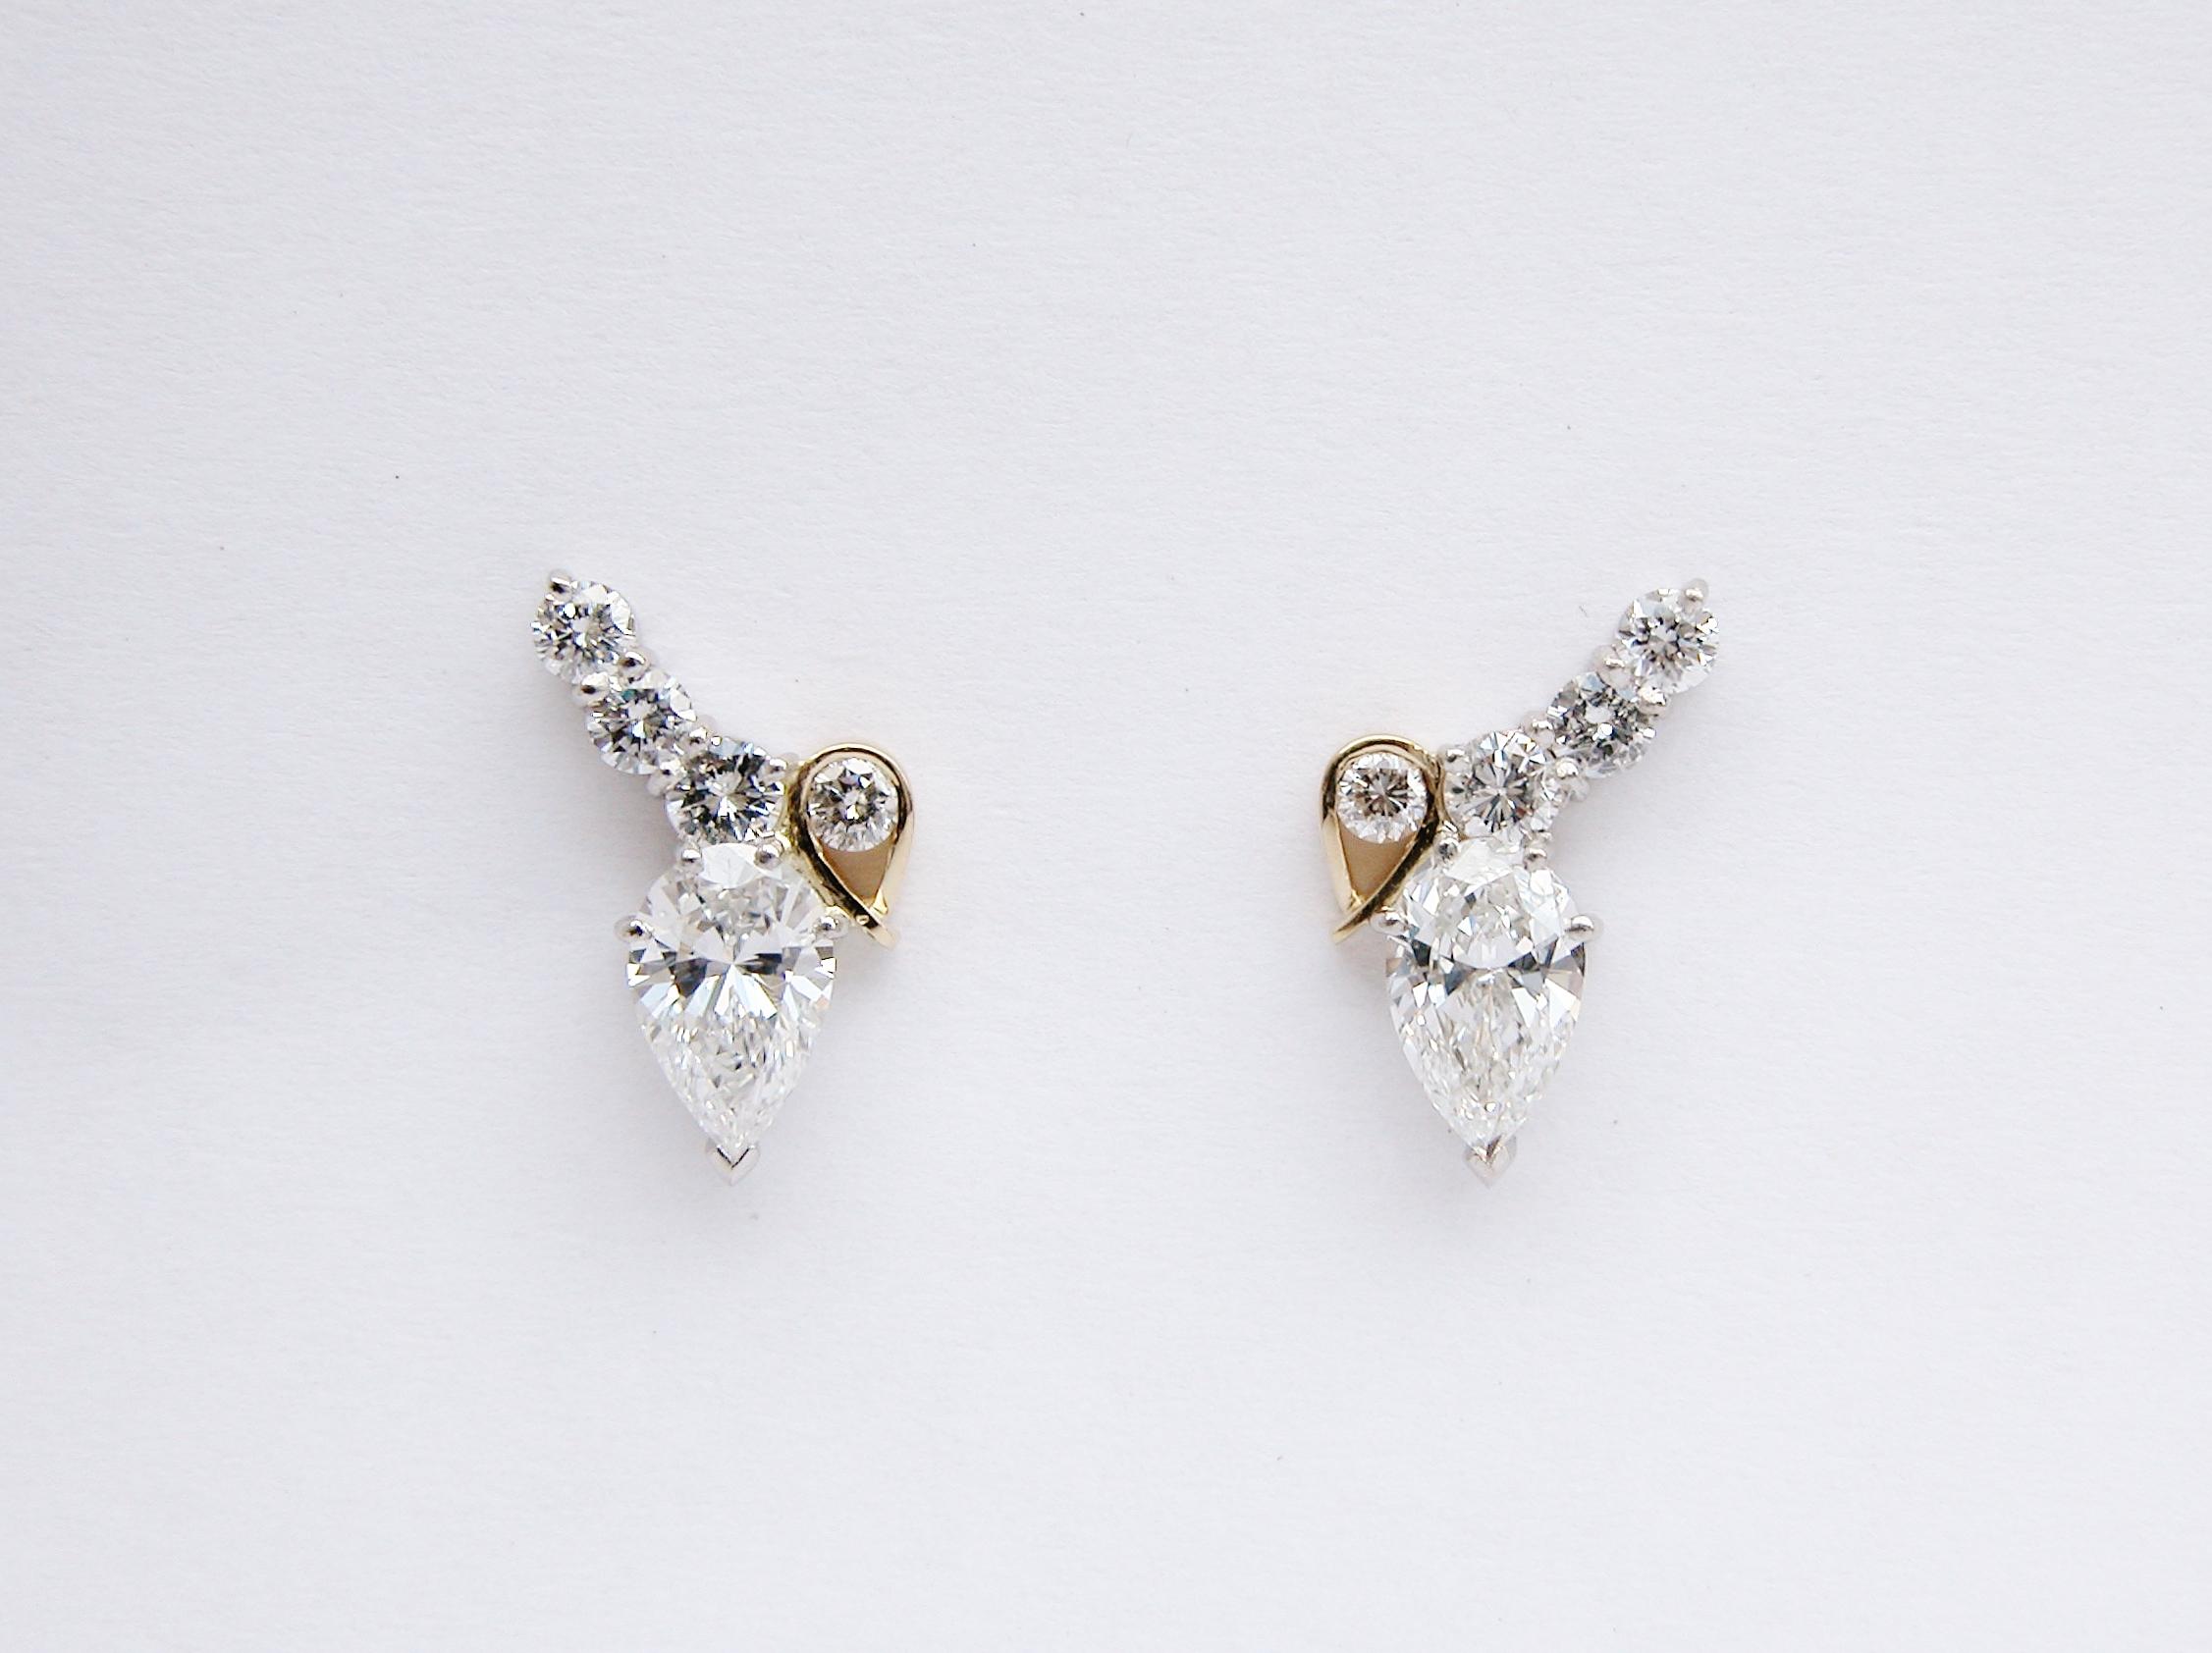 Platinum & 18ct. yellow gold pear shaped diamond &round brilliant cut diamond 5 stone stud earrings.